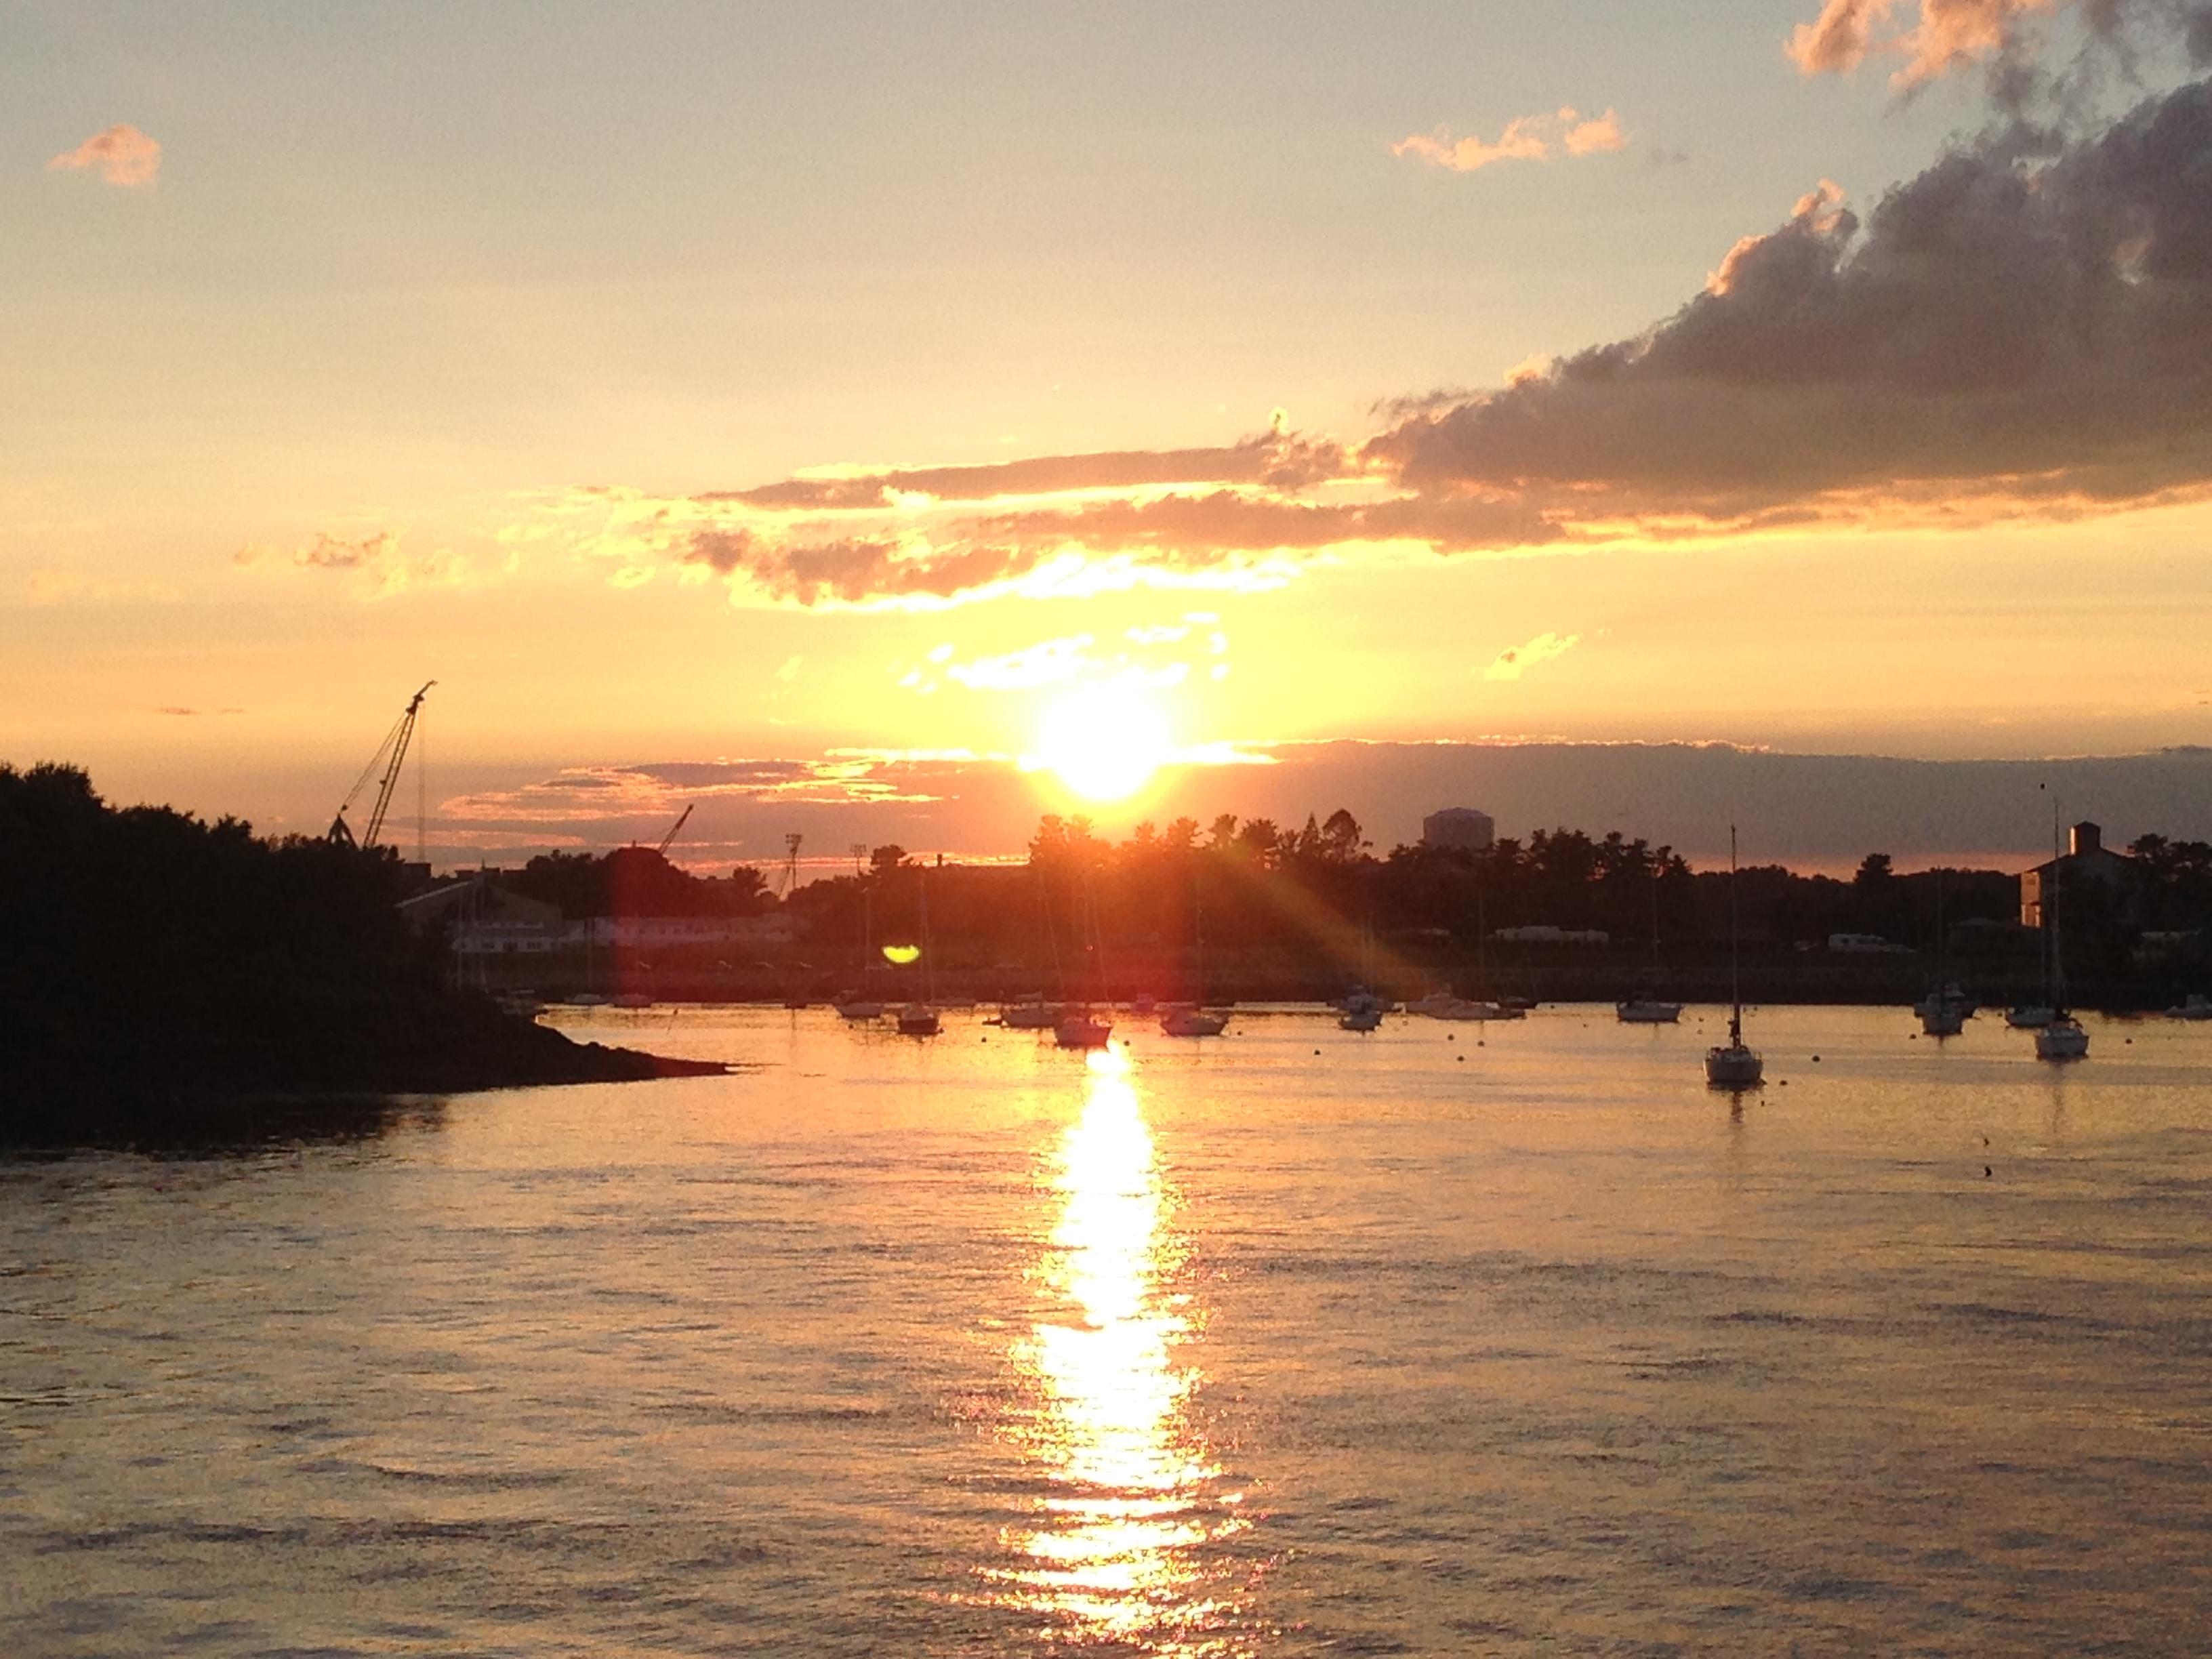 Sunset Cruise aboard M/V Challenger Image